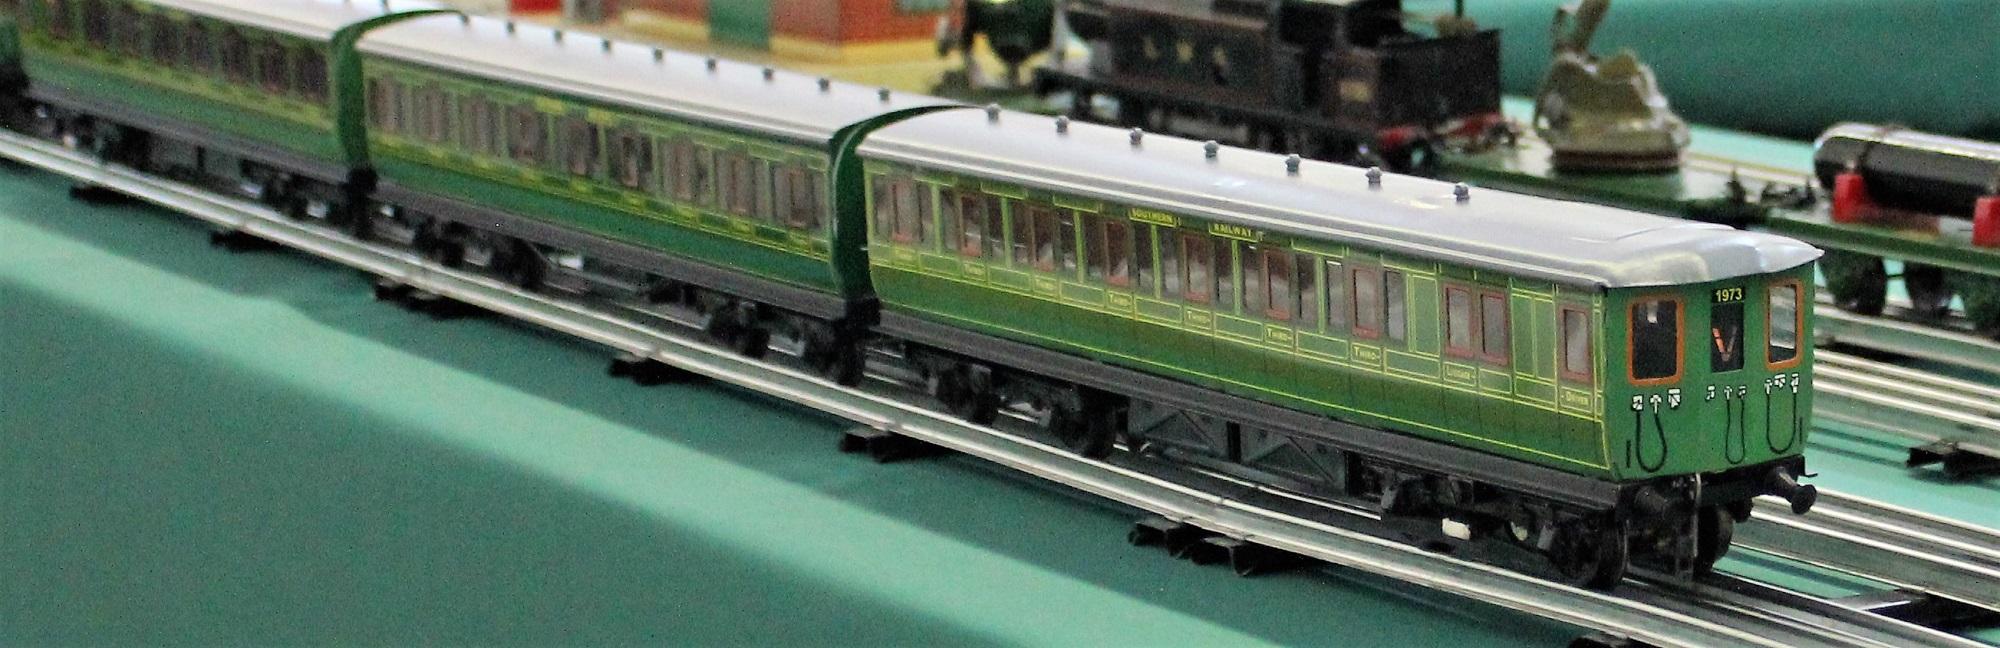 ACE Southern Railways EMU